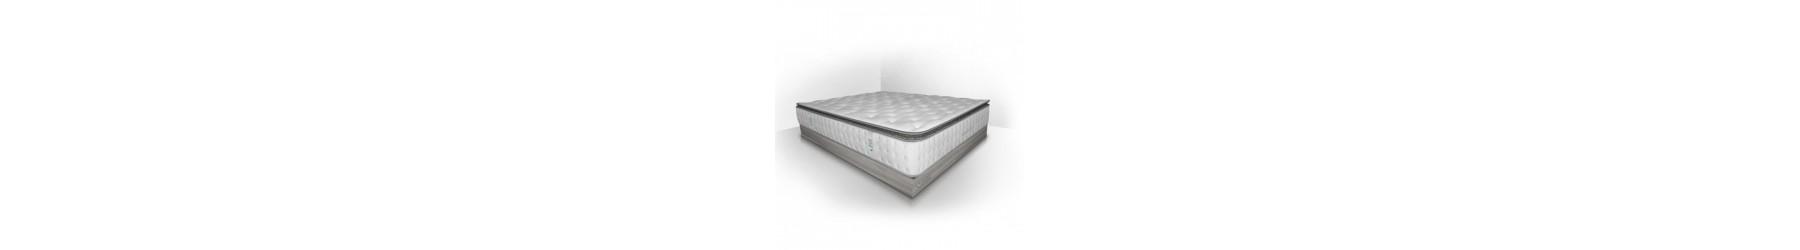 ECO SLEEP Στρώματα με ανατομικό και ορθοπεδικό σχεδιασμό